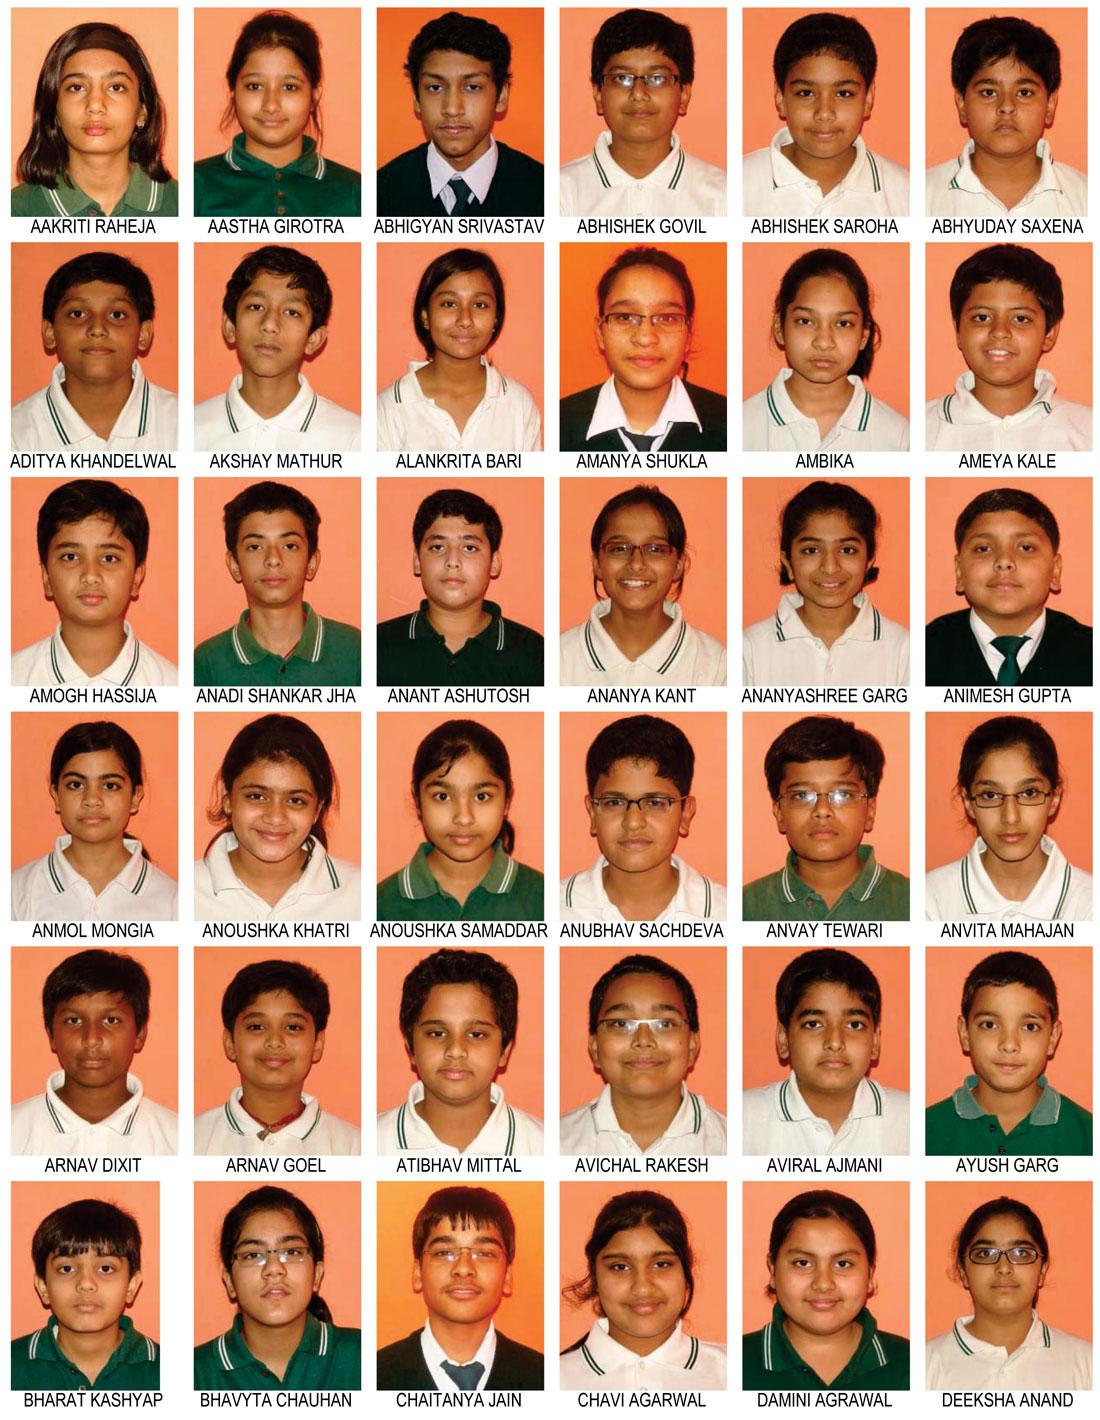 delhi public school r k puram new delhi 148 students scoring top scores a1 in all 5 subjects i e cumulative grade point average as 10